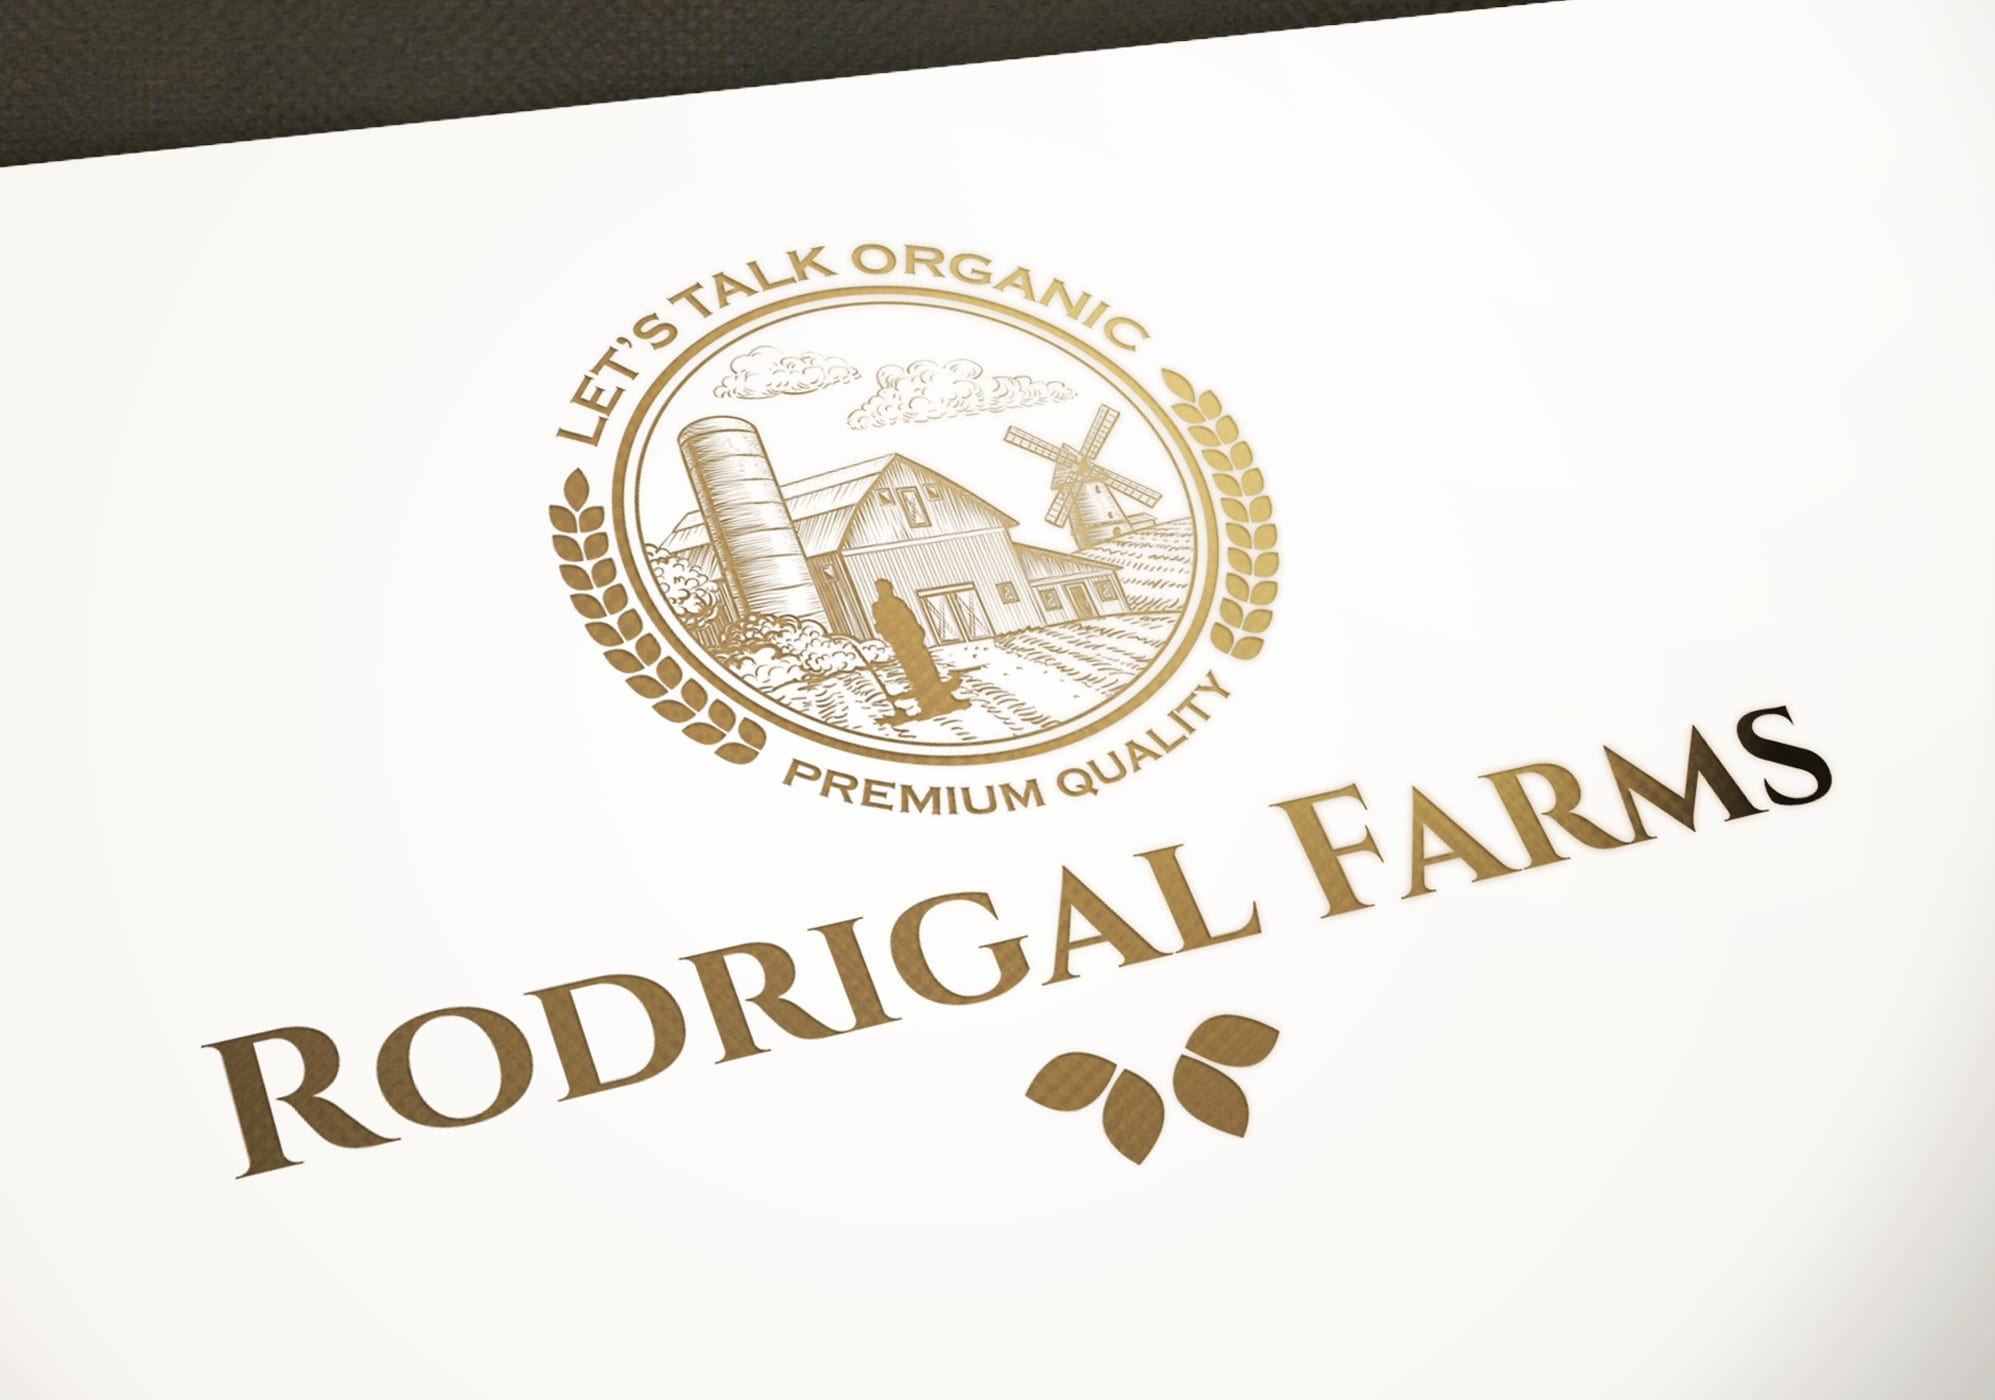 fiverr vintage logos